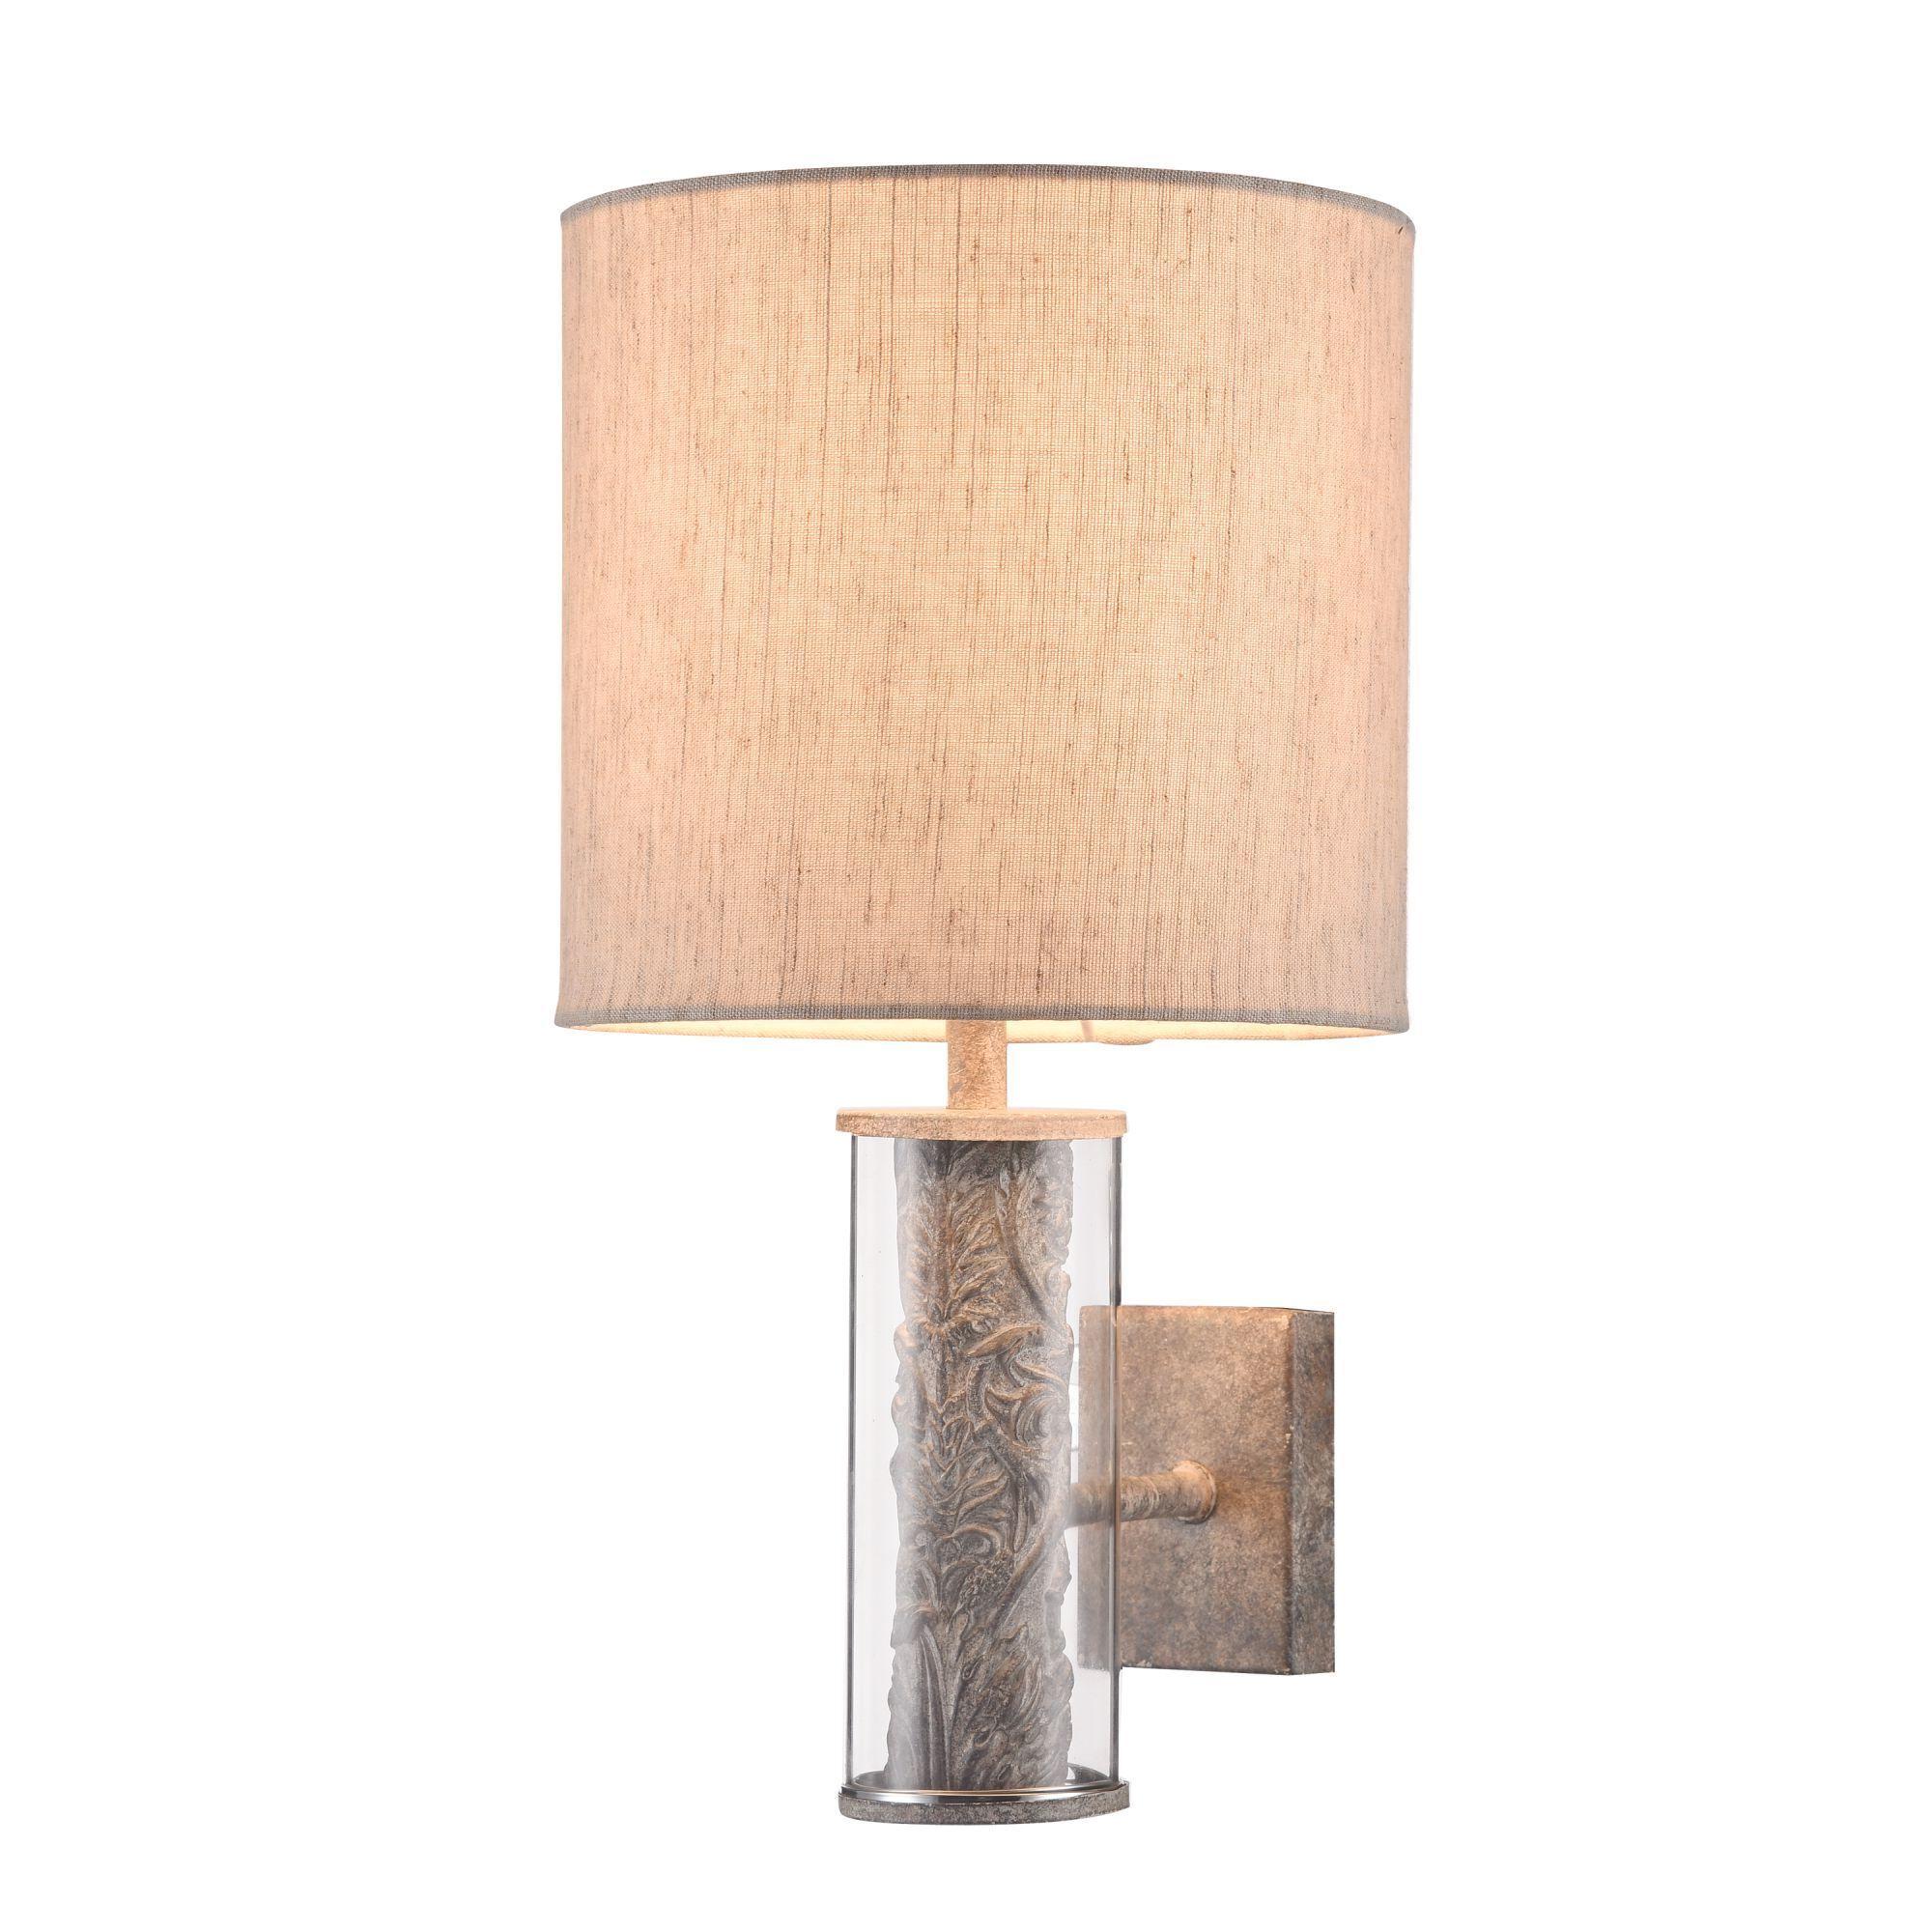 Бра Maytoni Maryland ARM526WL-01GR, 1xE14x40W, серый с прозрачным, серый, стекло с металлом, текстиль - фото 2